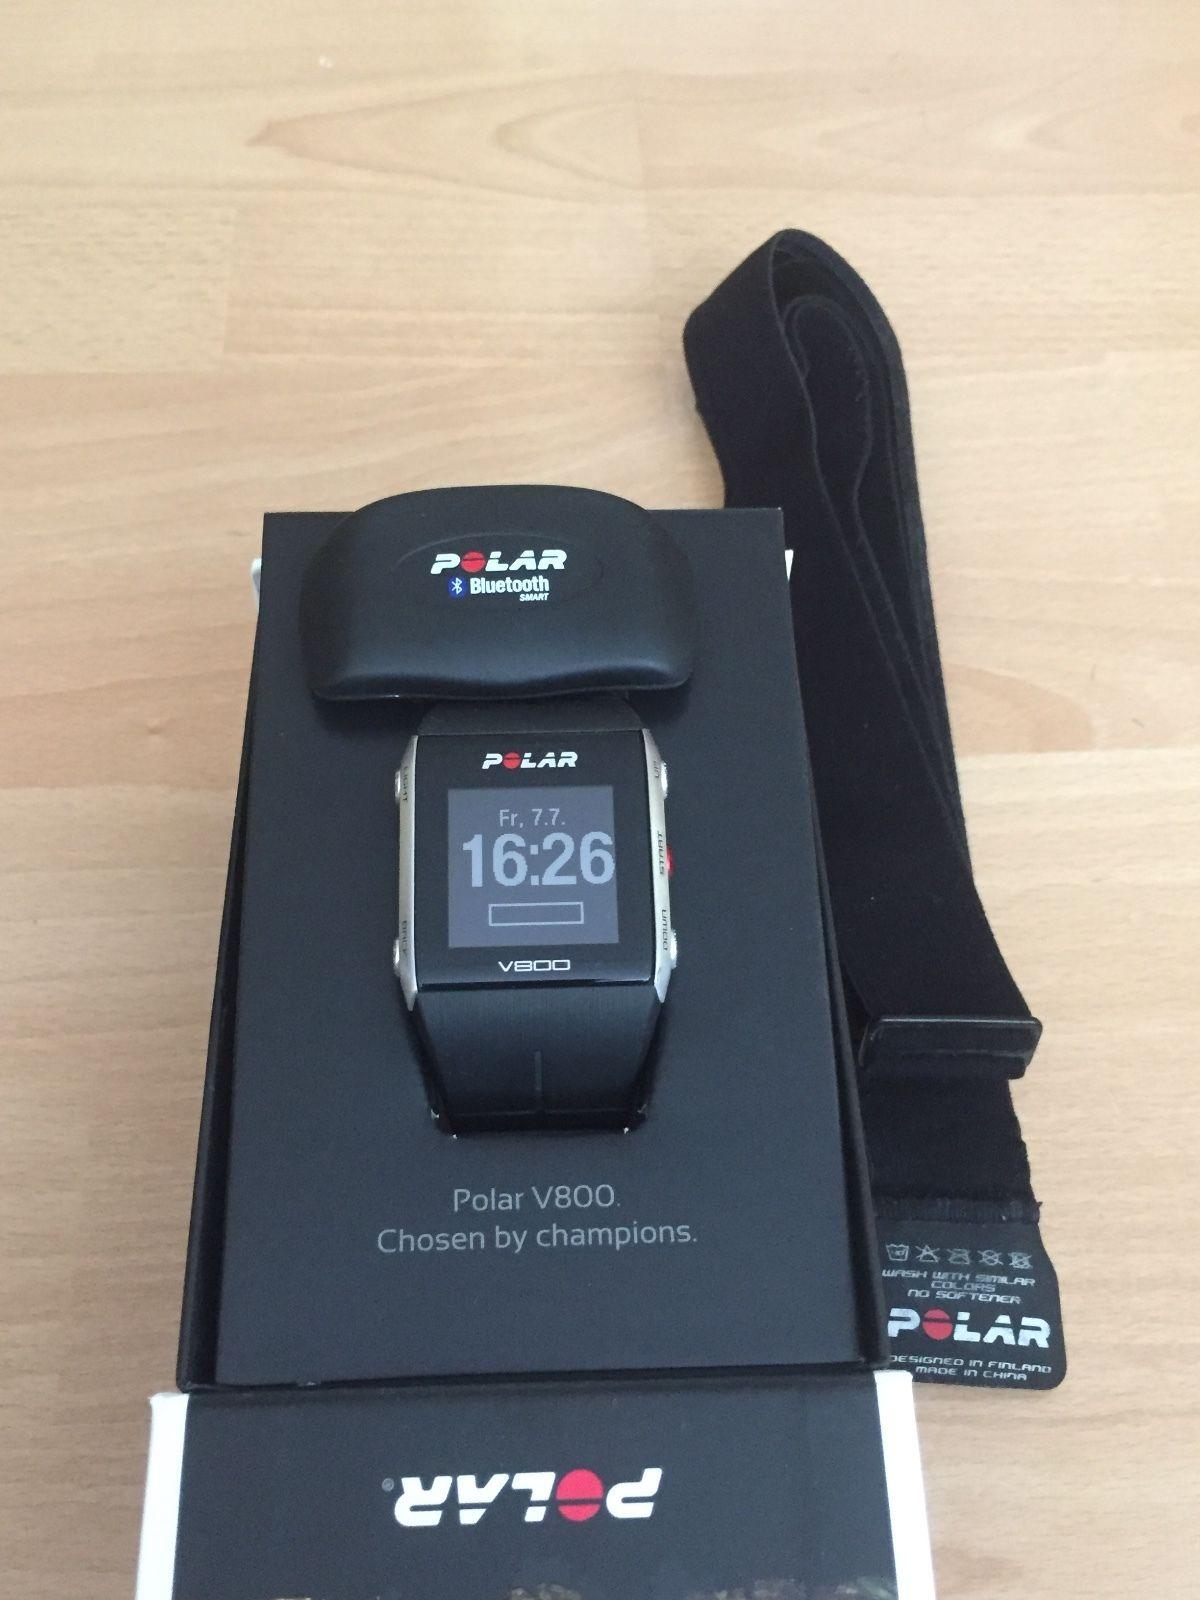 Polar V800 - GPS Sportuhr mit Brustgurt/Herzfrequenzsensor H7